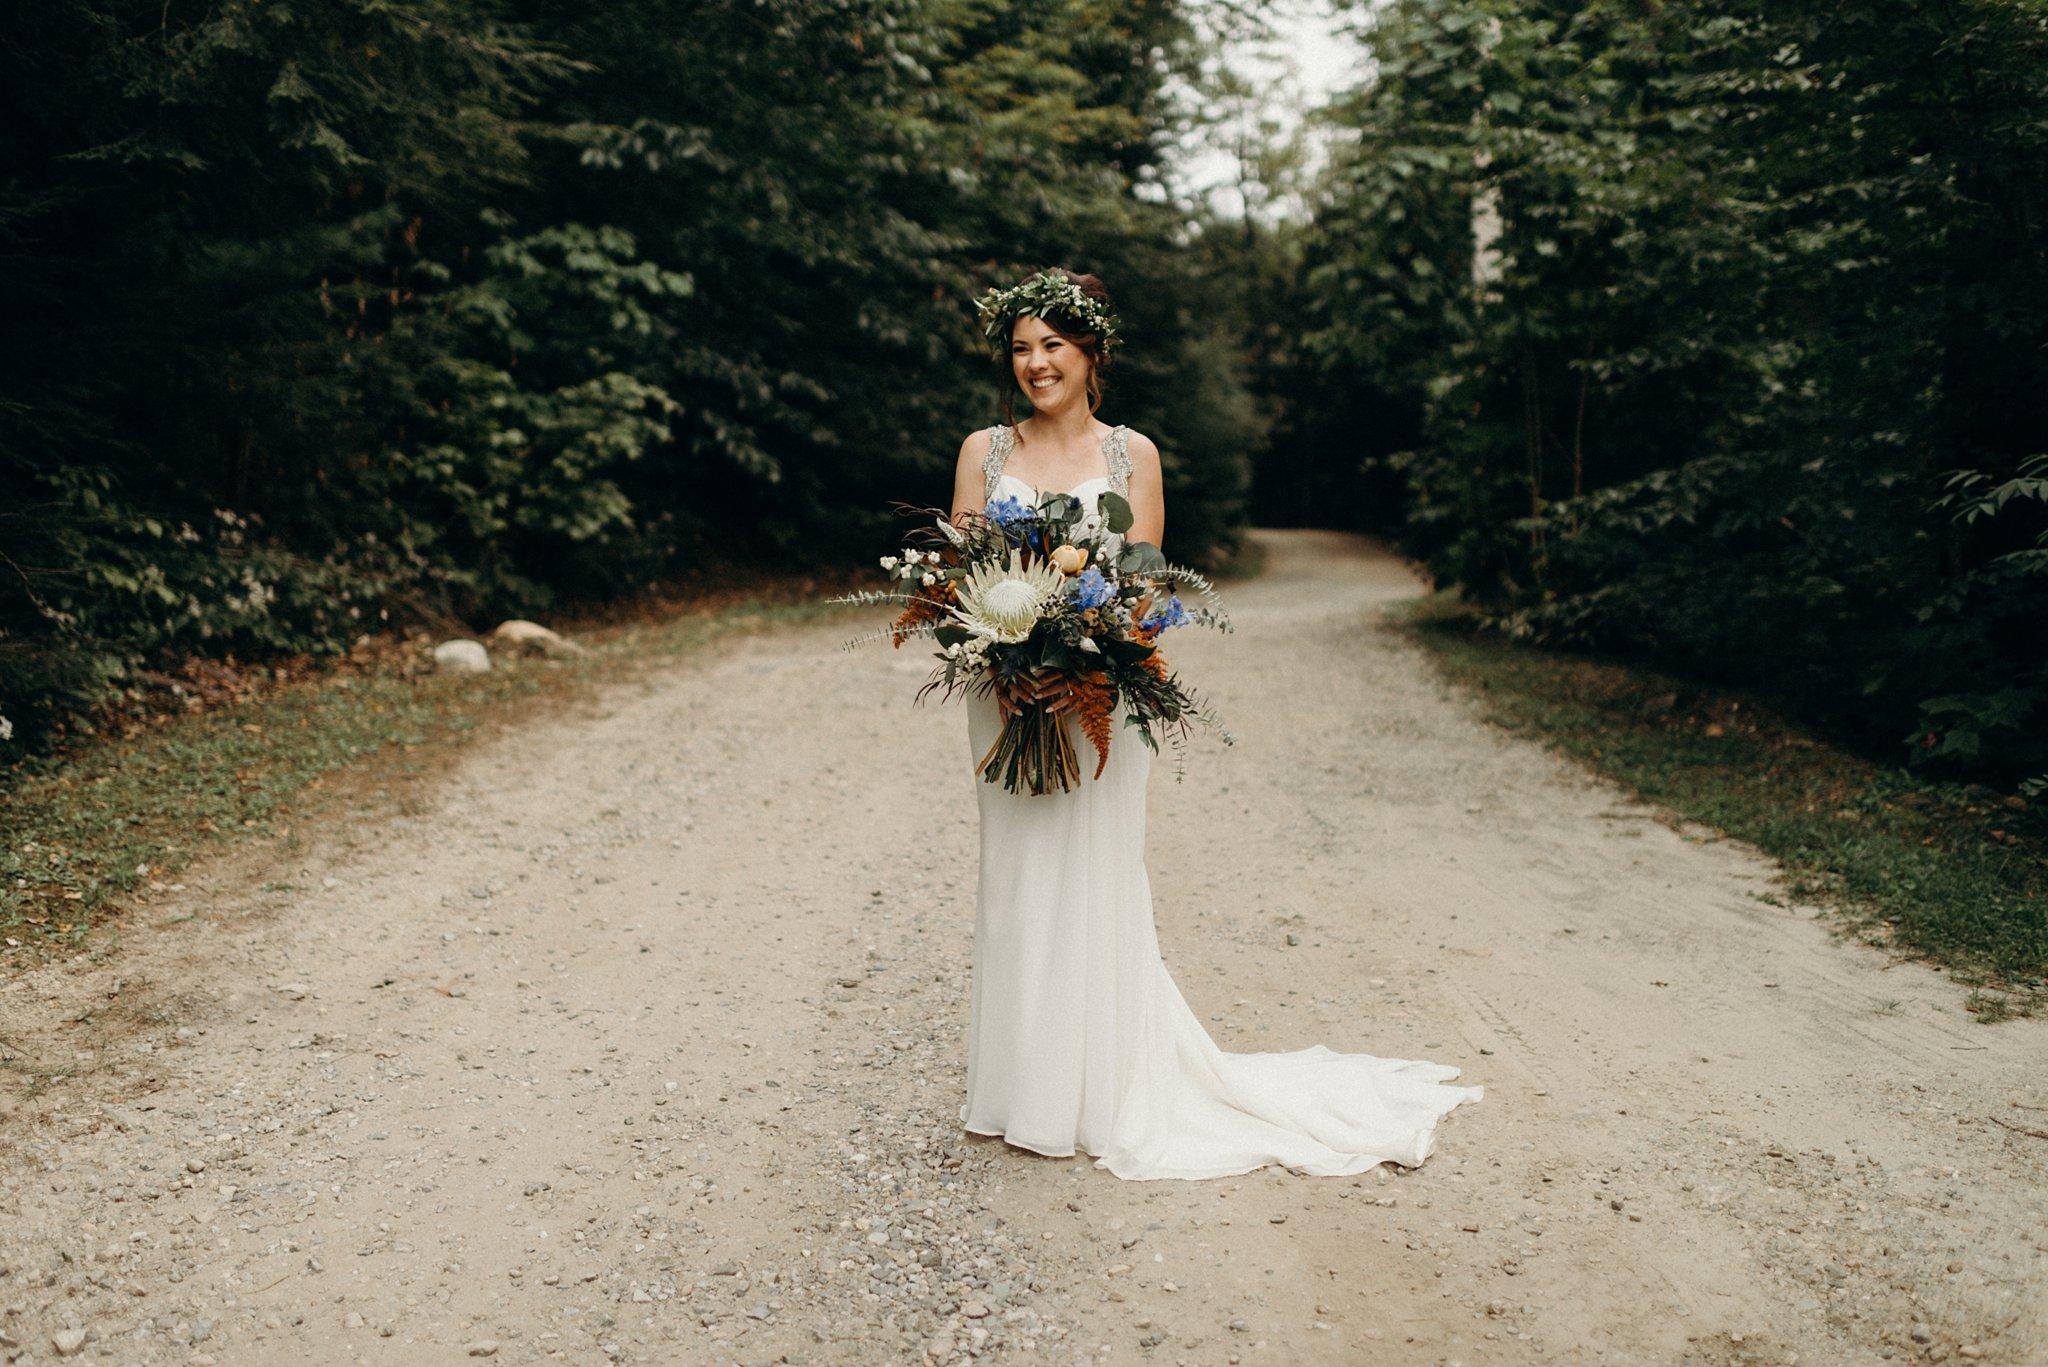 kaihla_tonai_intimate_wedding_elopement_photographer_6596.jpg